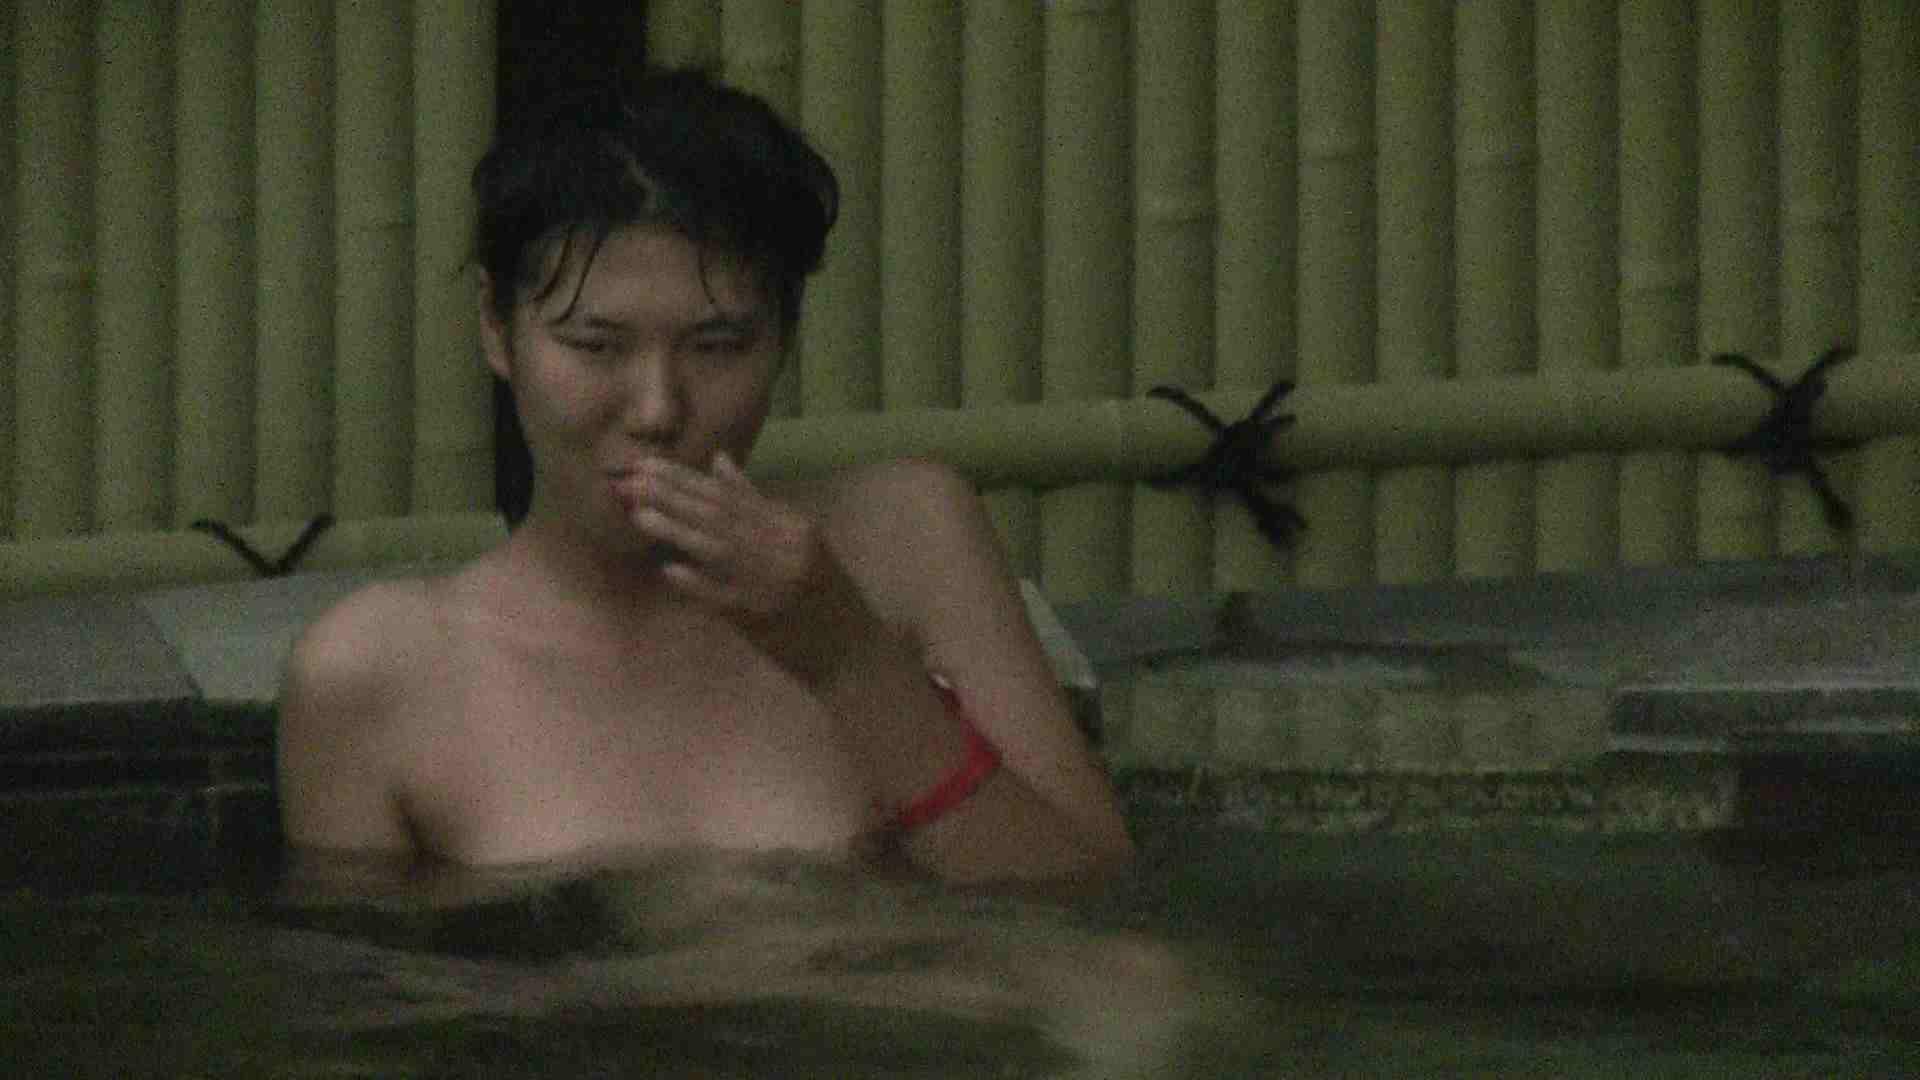 Aquaな露天風呂Vol.215 盗撮 おまんこ無修正動画無料 106枚 53